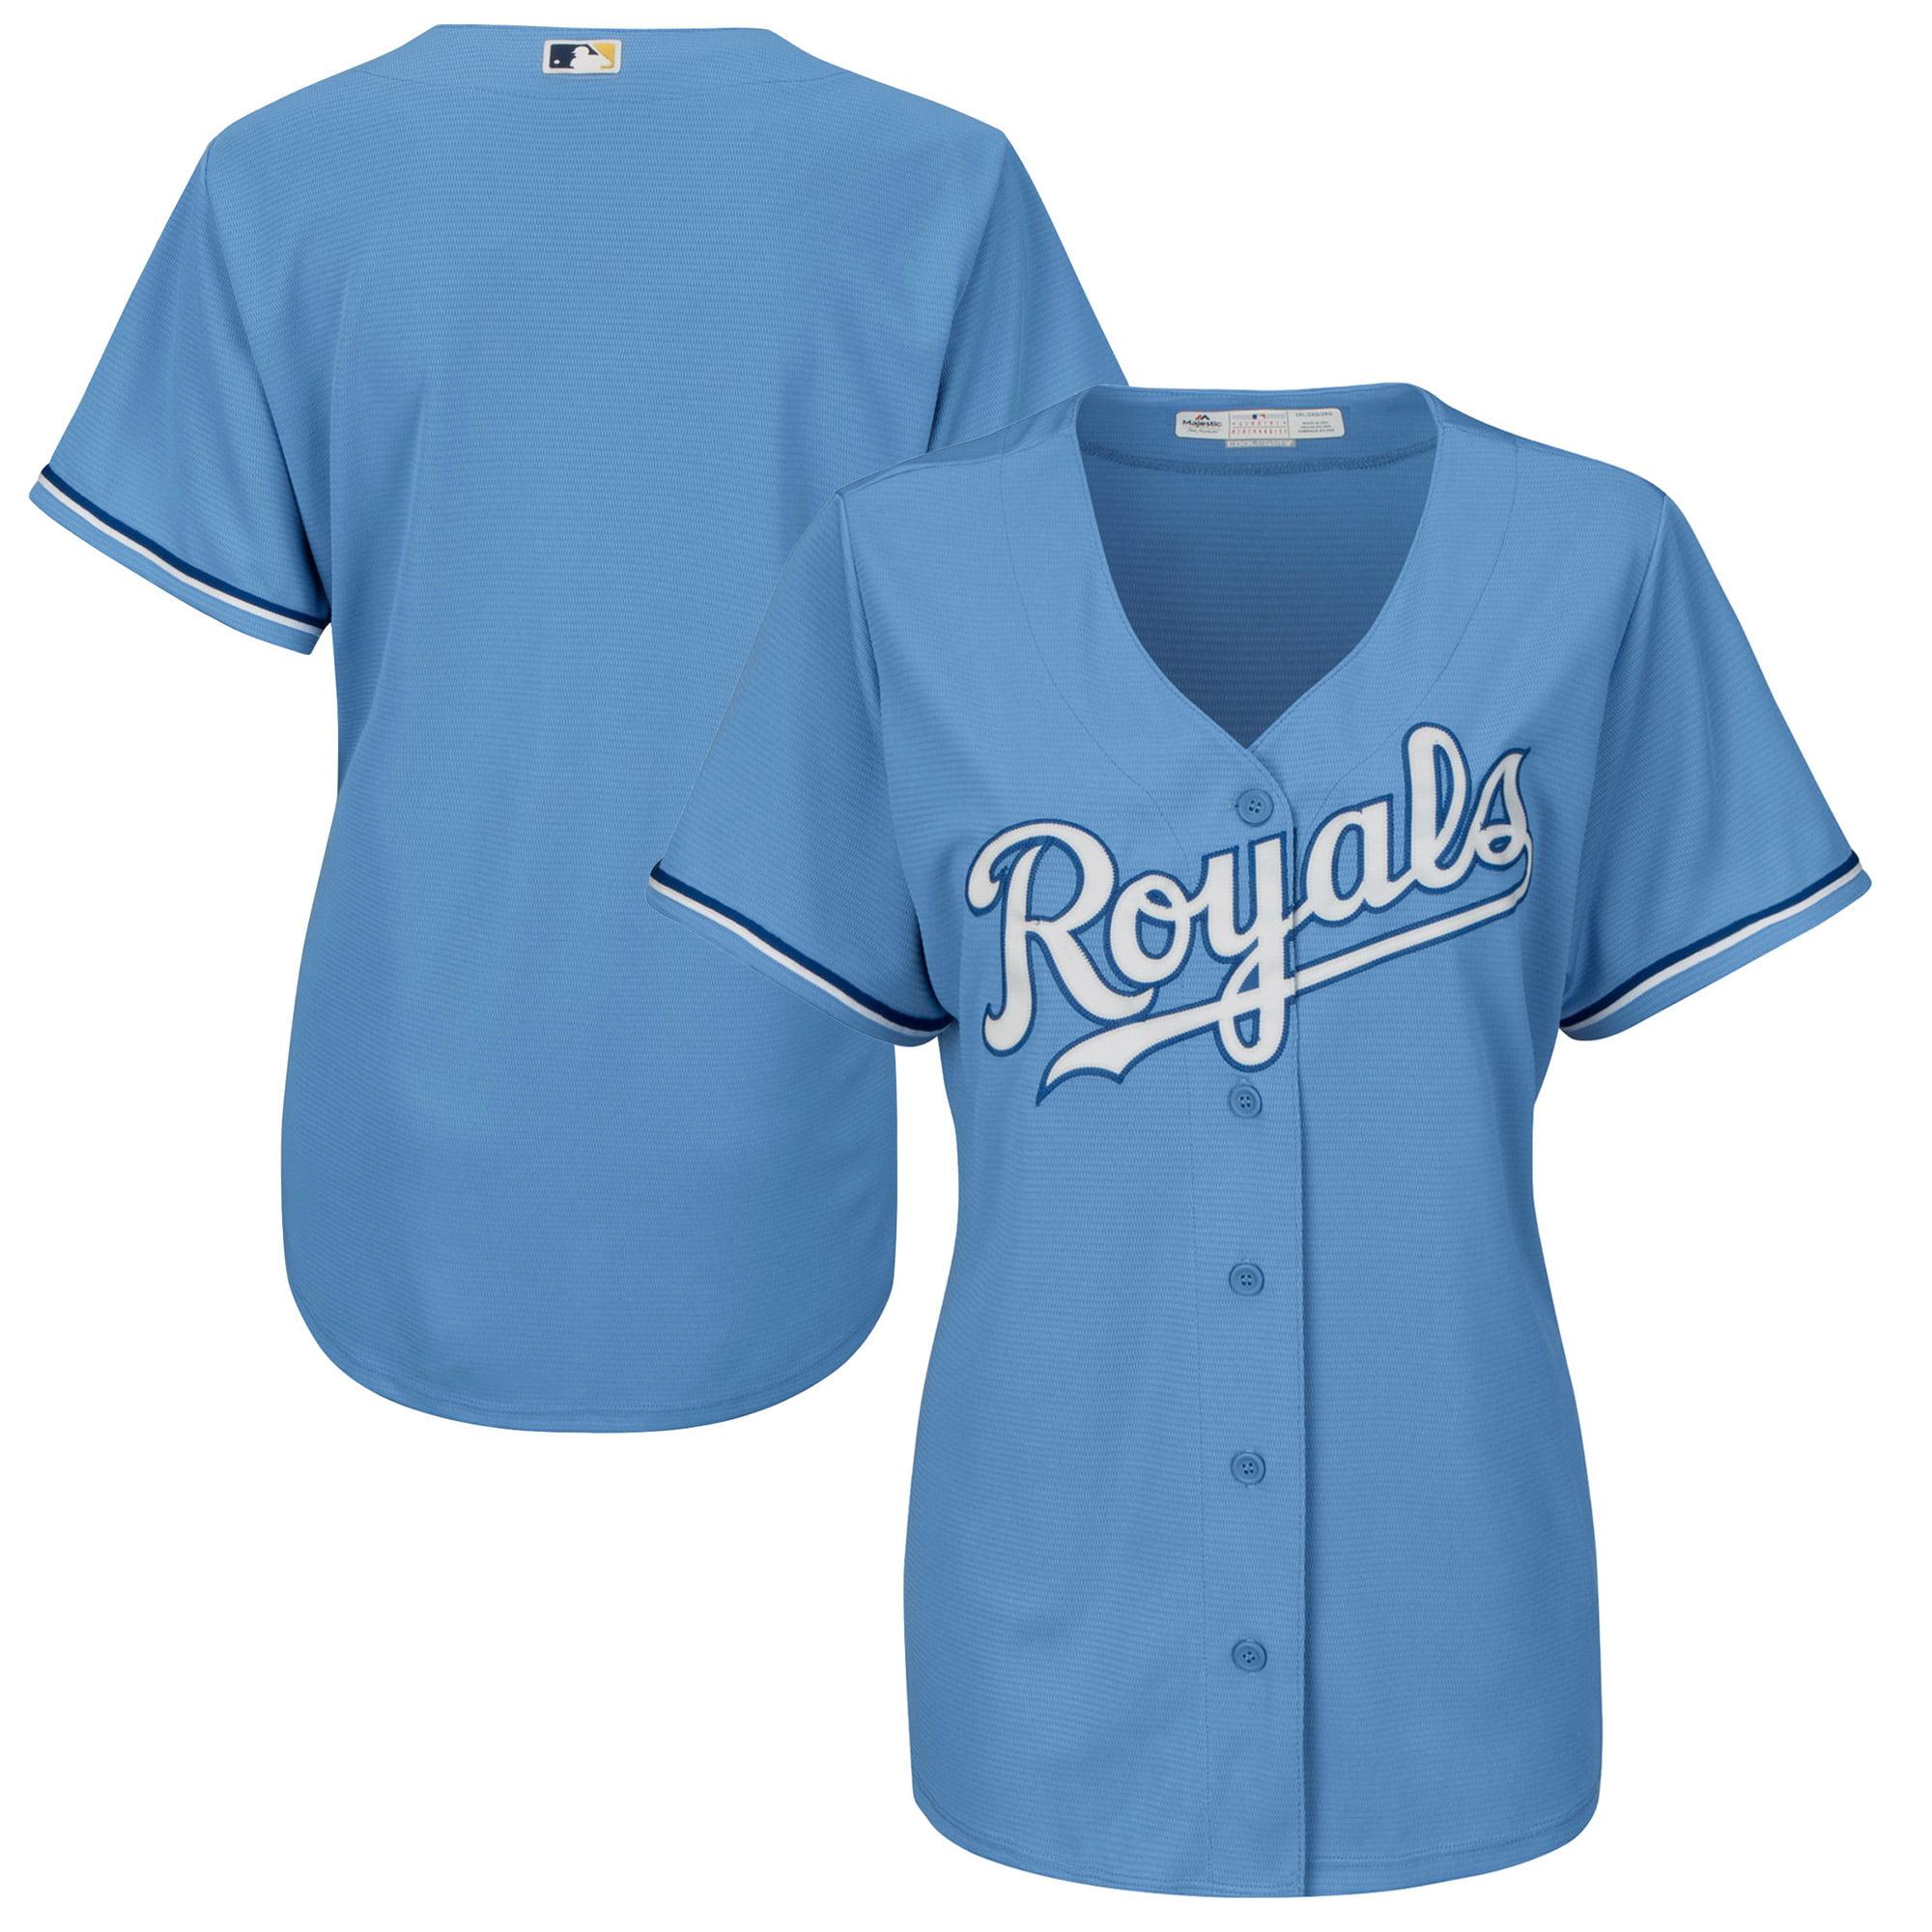 Kansas City Royals Majestic Women's Cool Base Jersey Light Blue by MAJESTIC LSG